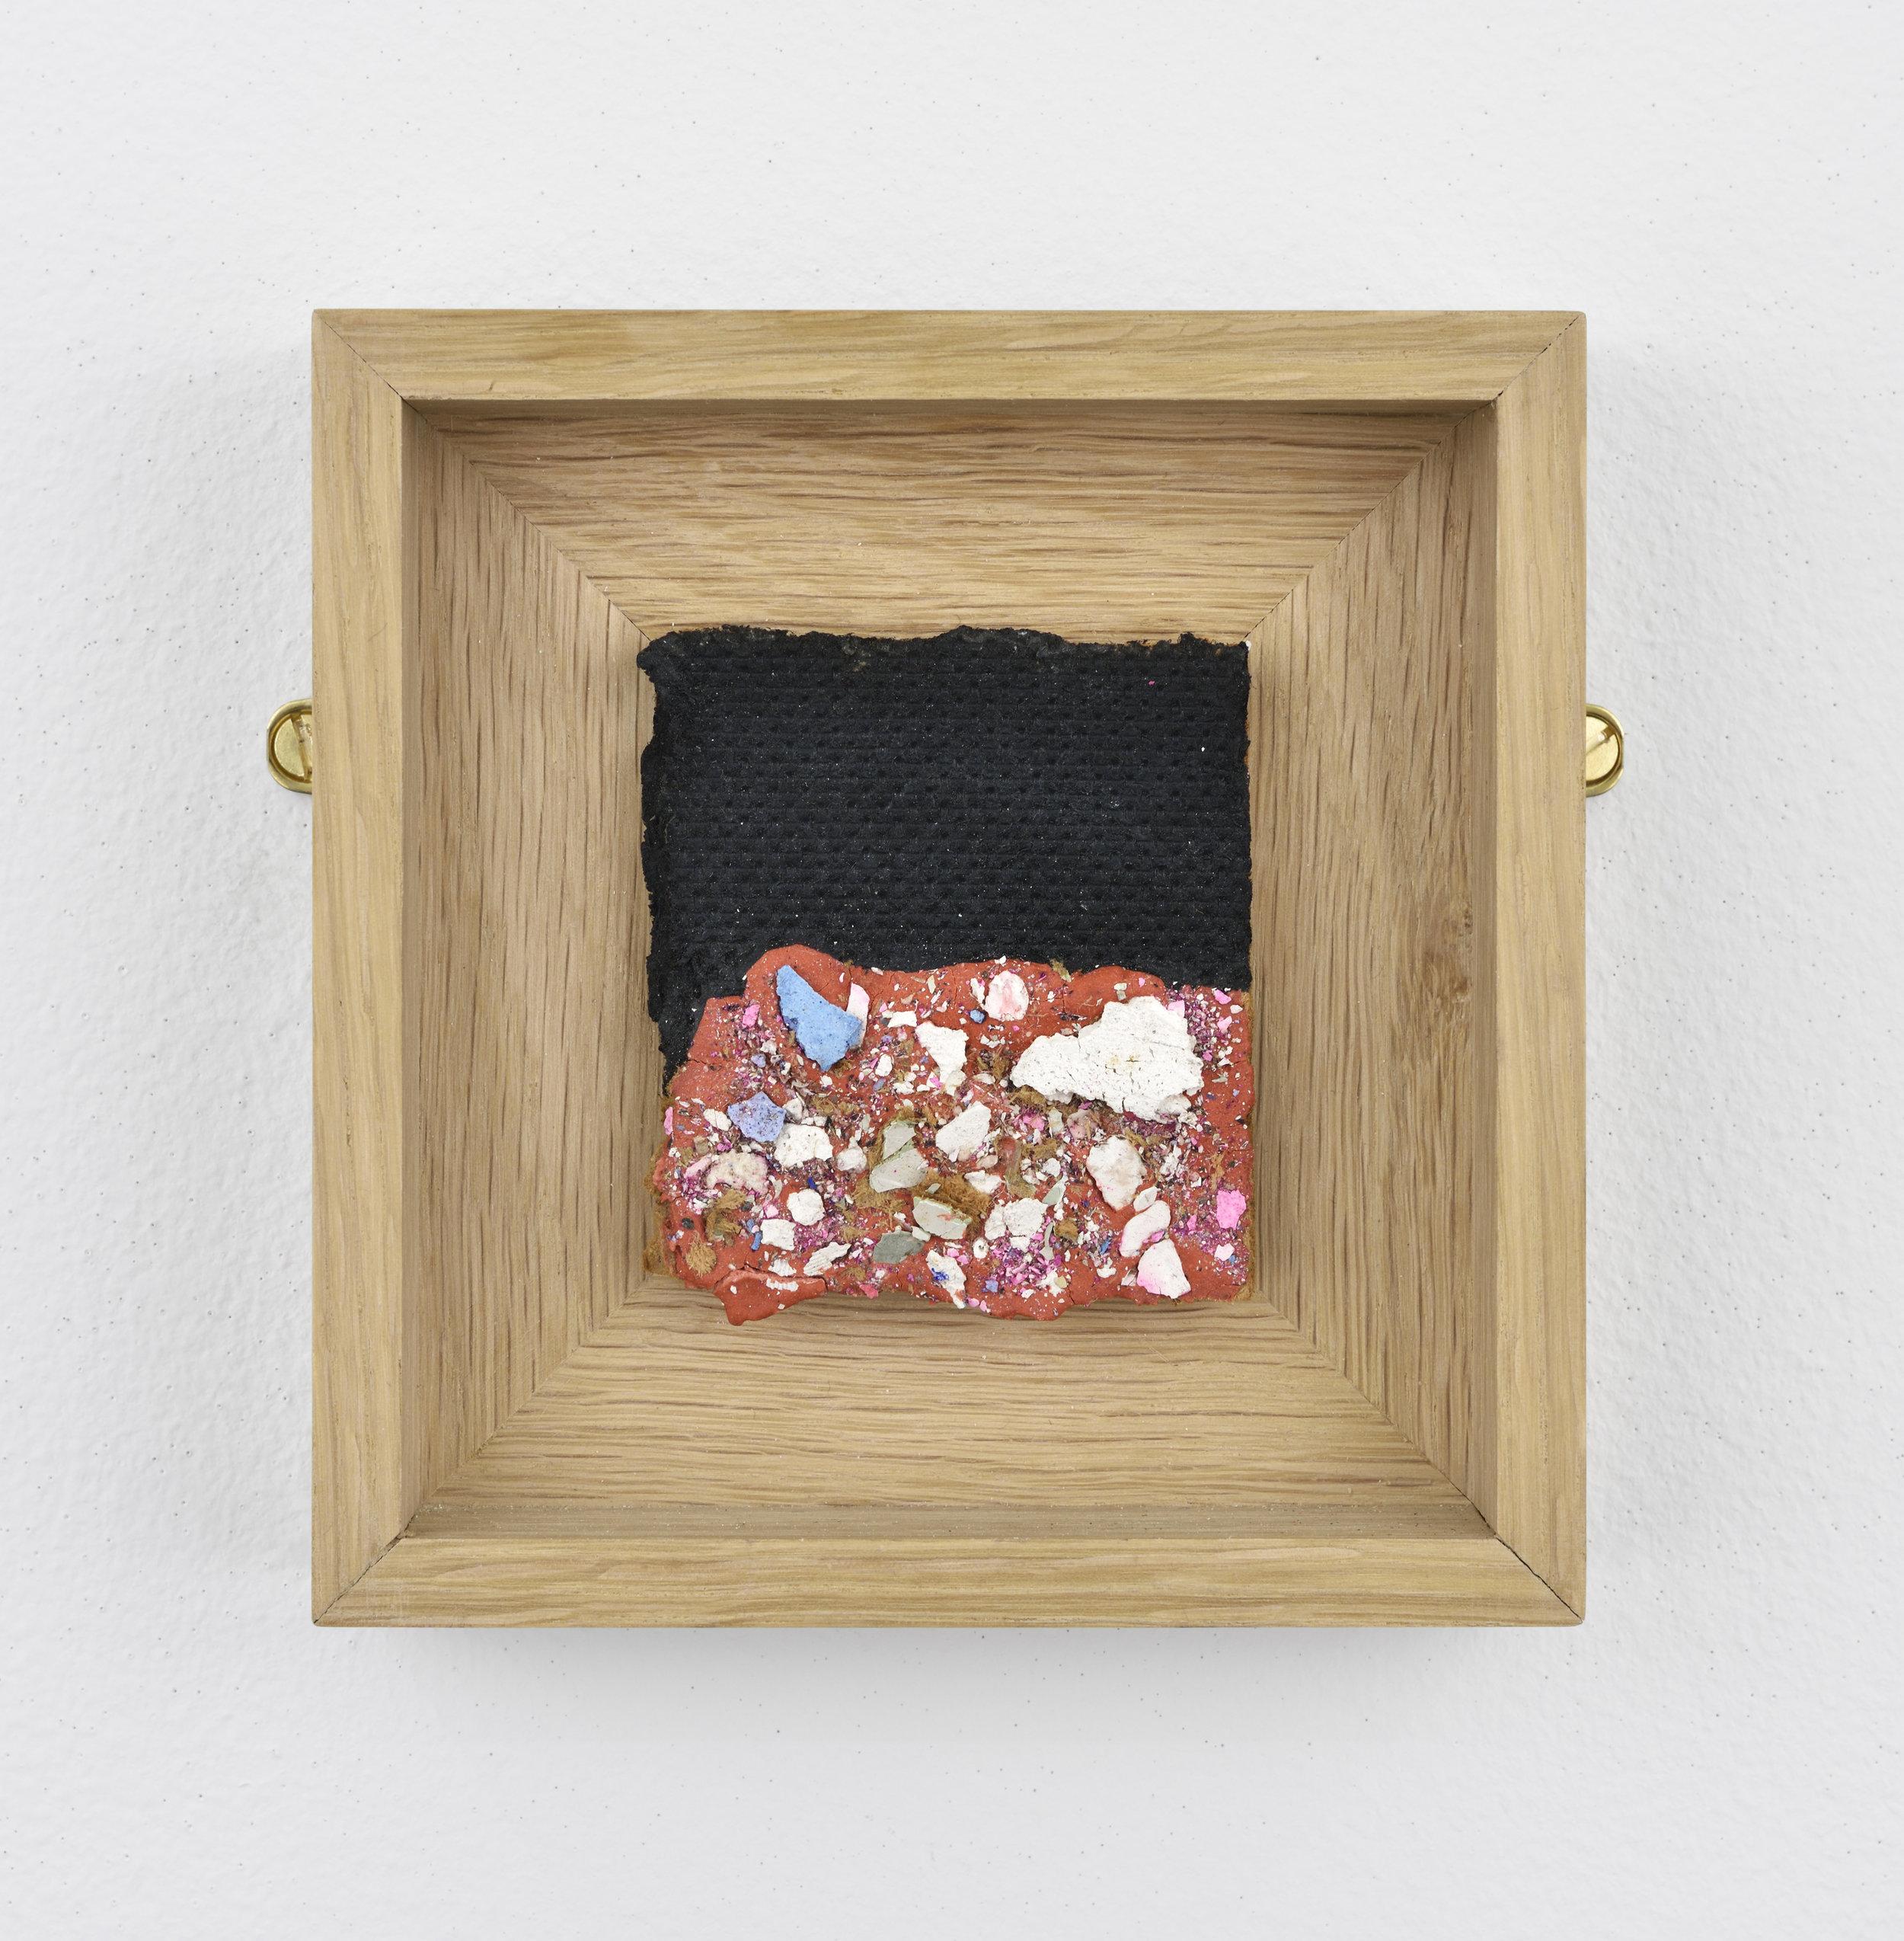 Niki de SAINT PHALLE Bits 2, 1960 plaster, paint and vatious objects on isorel 4 23/32 x 4 17/32 x 1 5/16 in (12 x 11,5 x 3,3 cm) Courtesy: Niki Charitable Art Foundation et Galerie GP&N Vallois, Paris